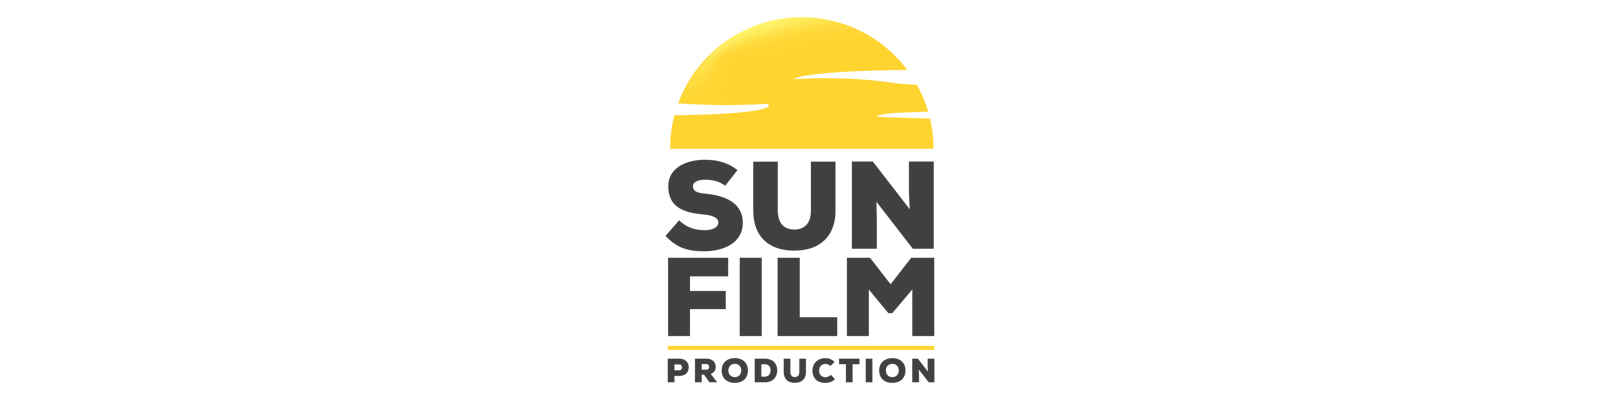 Sun Film Production banner fotograf